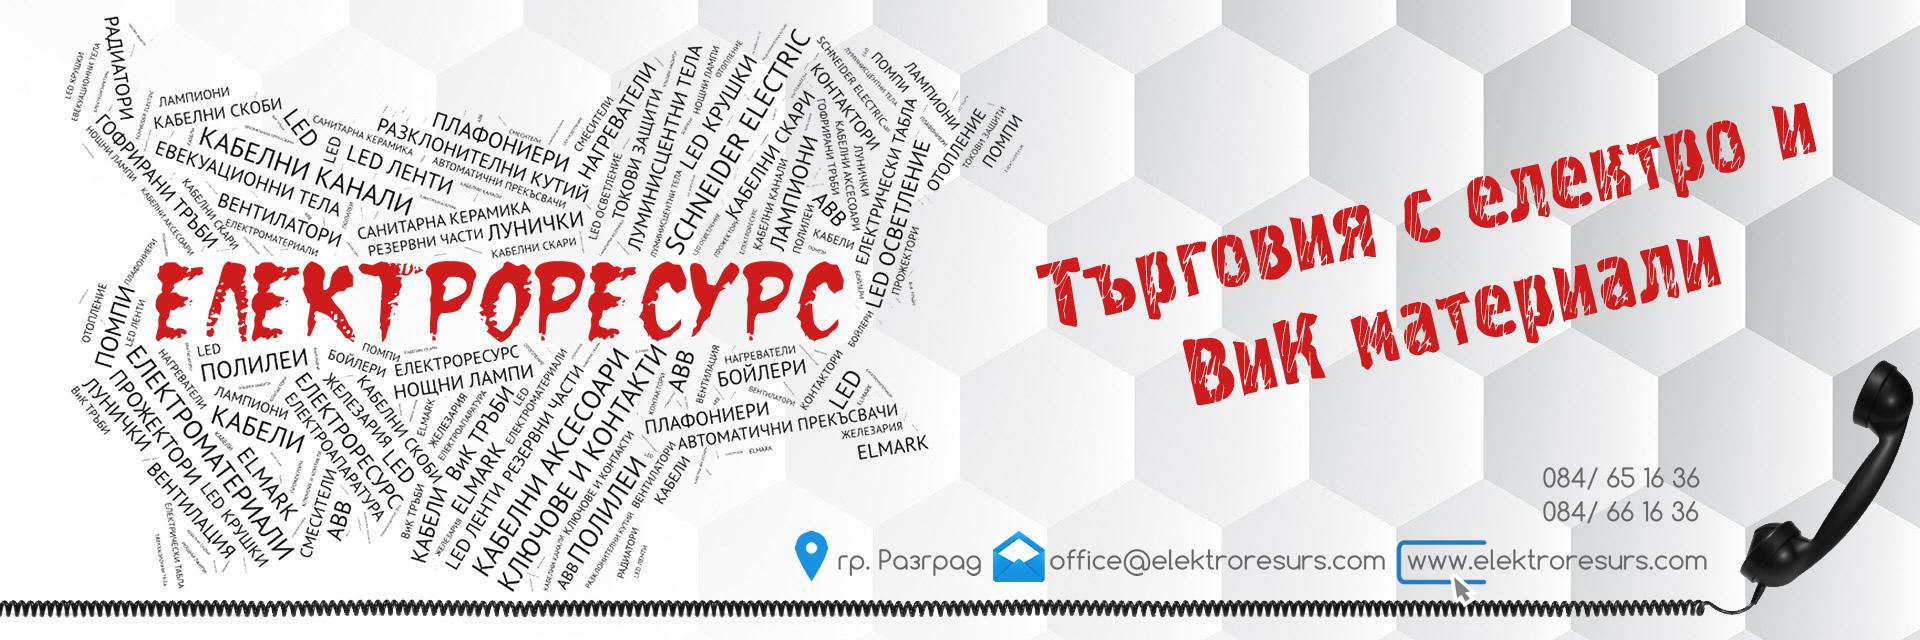 title_614af46e3441a15015145851632302190